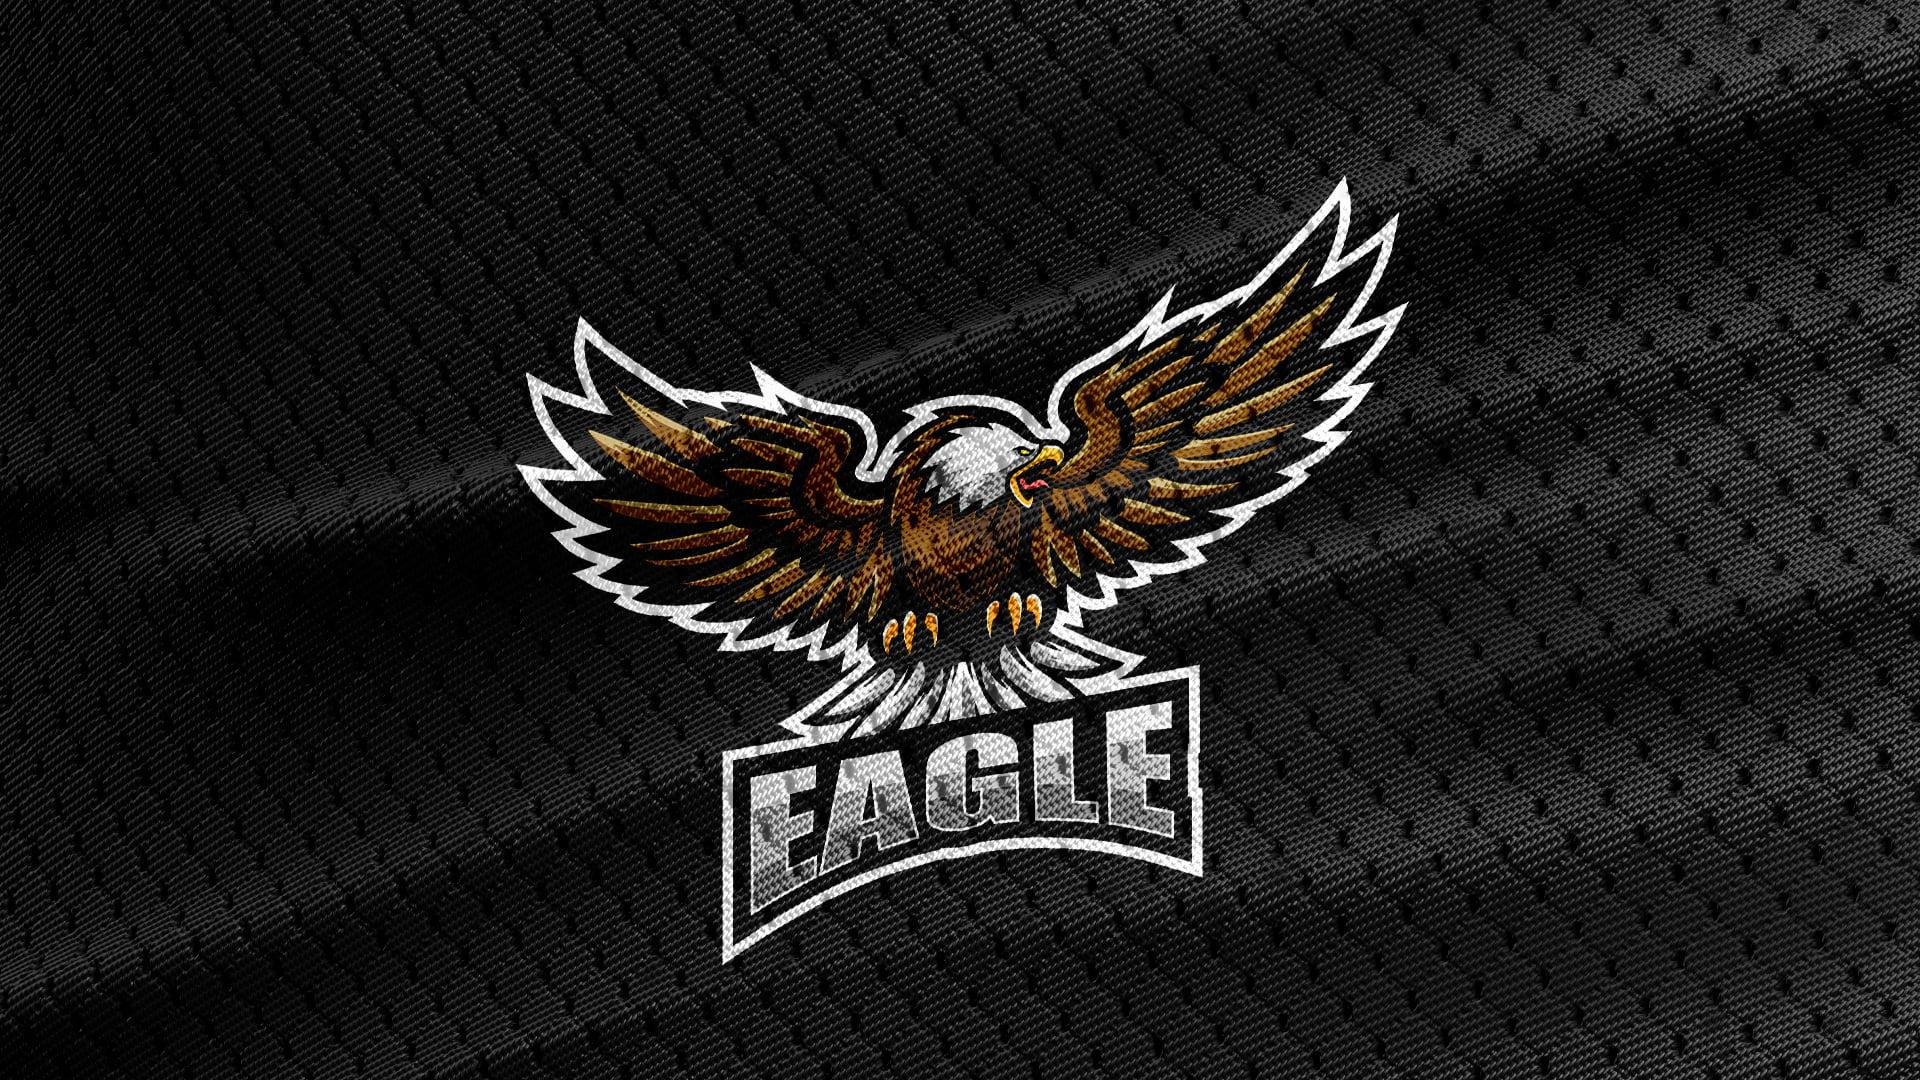 Free-Eagle-Mascot-Jersey-Black-Texture-Logo